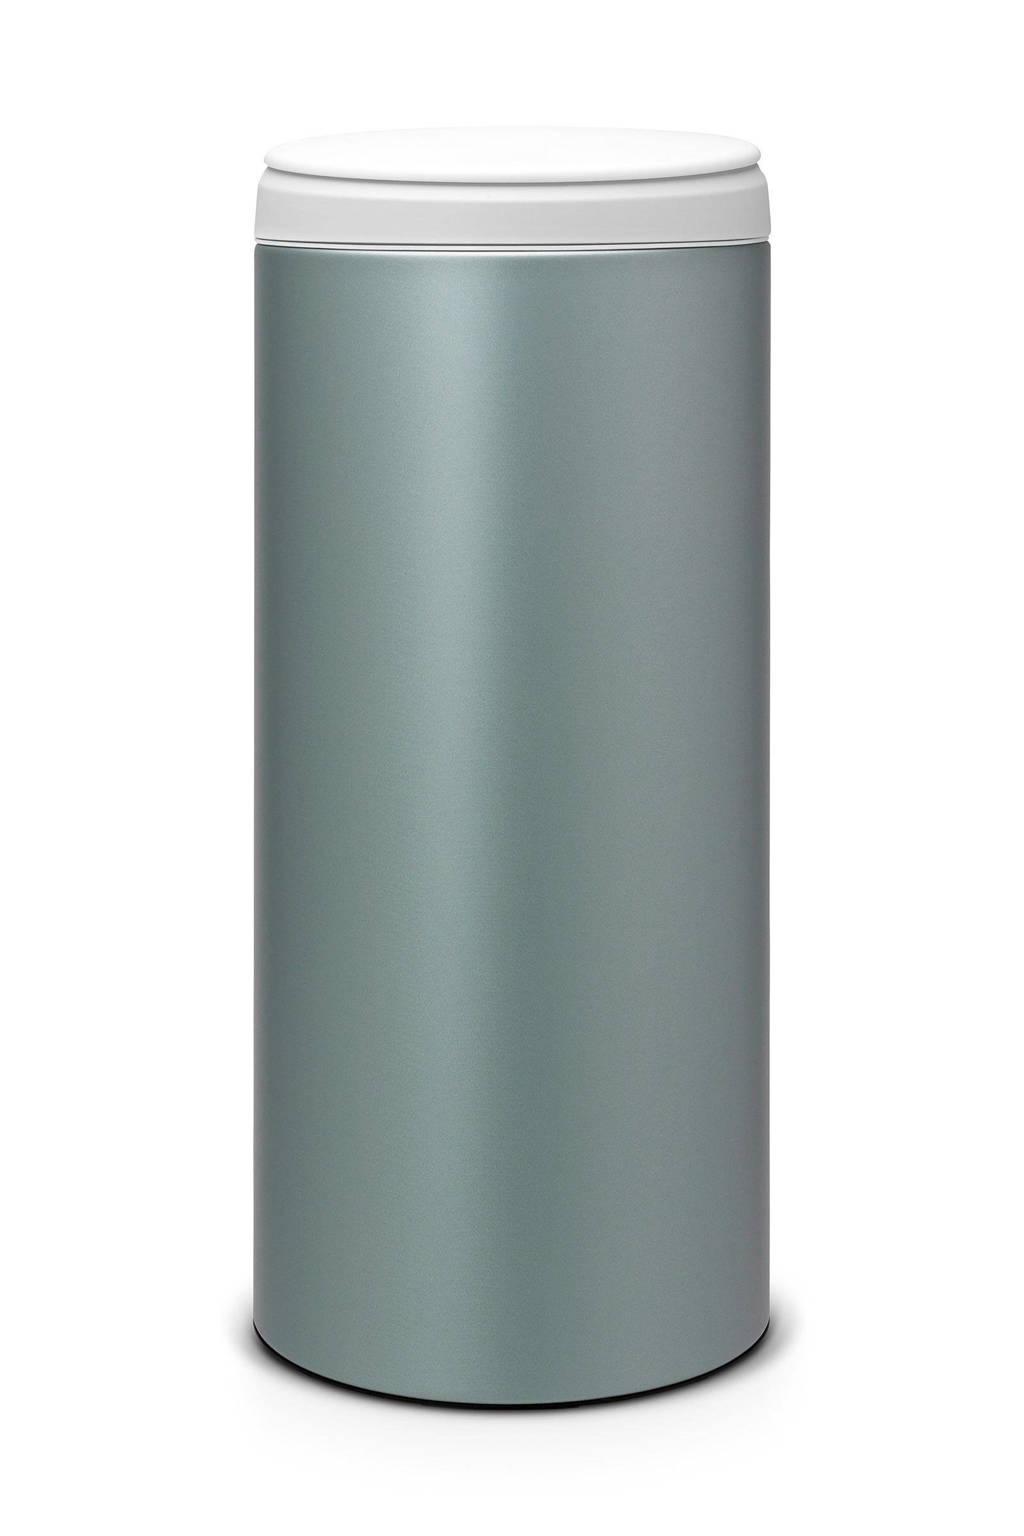 Brabantia FlipBin 30 liter prullenbak, Mint